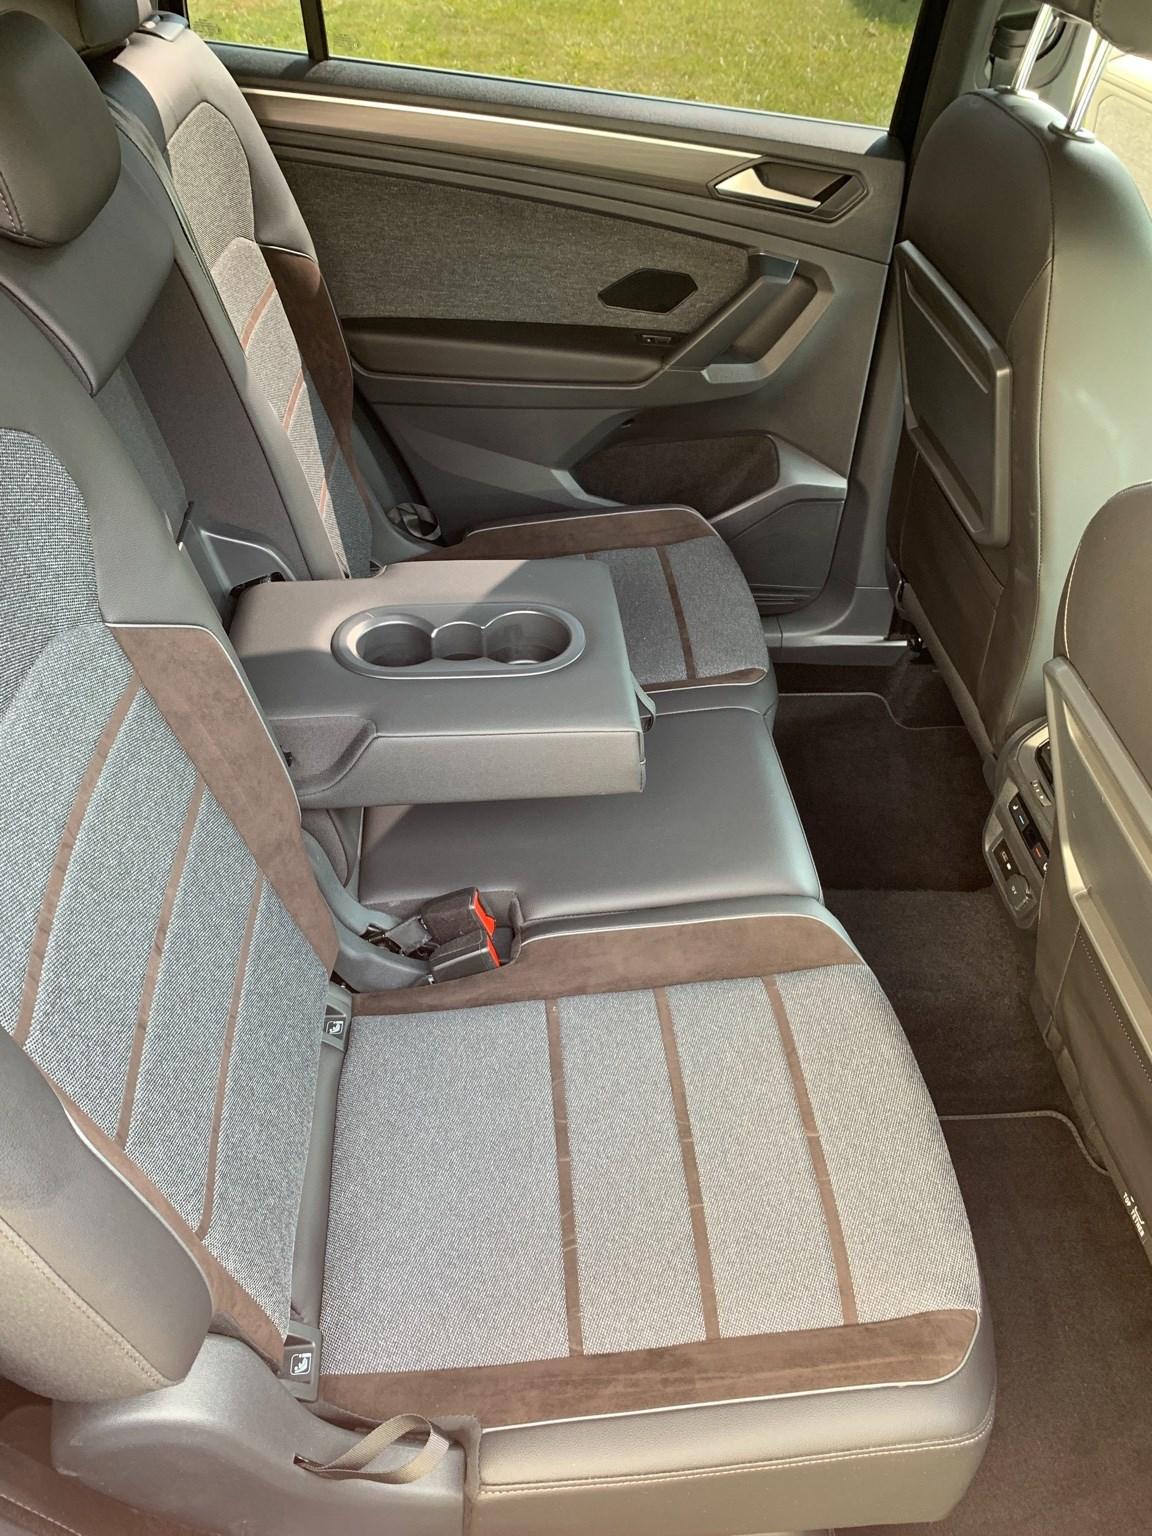 SEAT Tarraco 2.0 TSI Xcellence 4Drive DSG